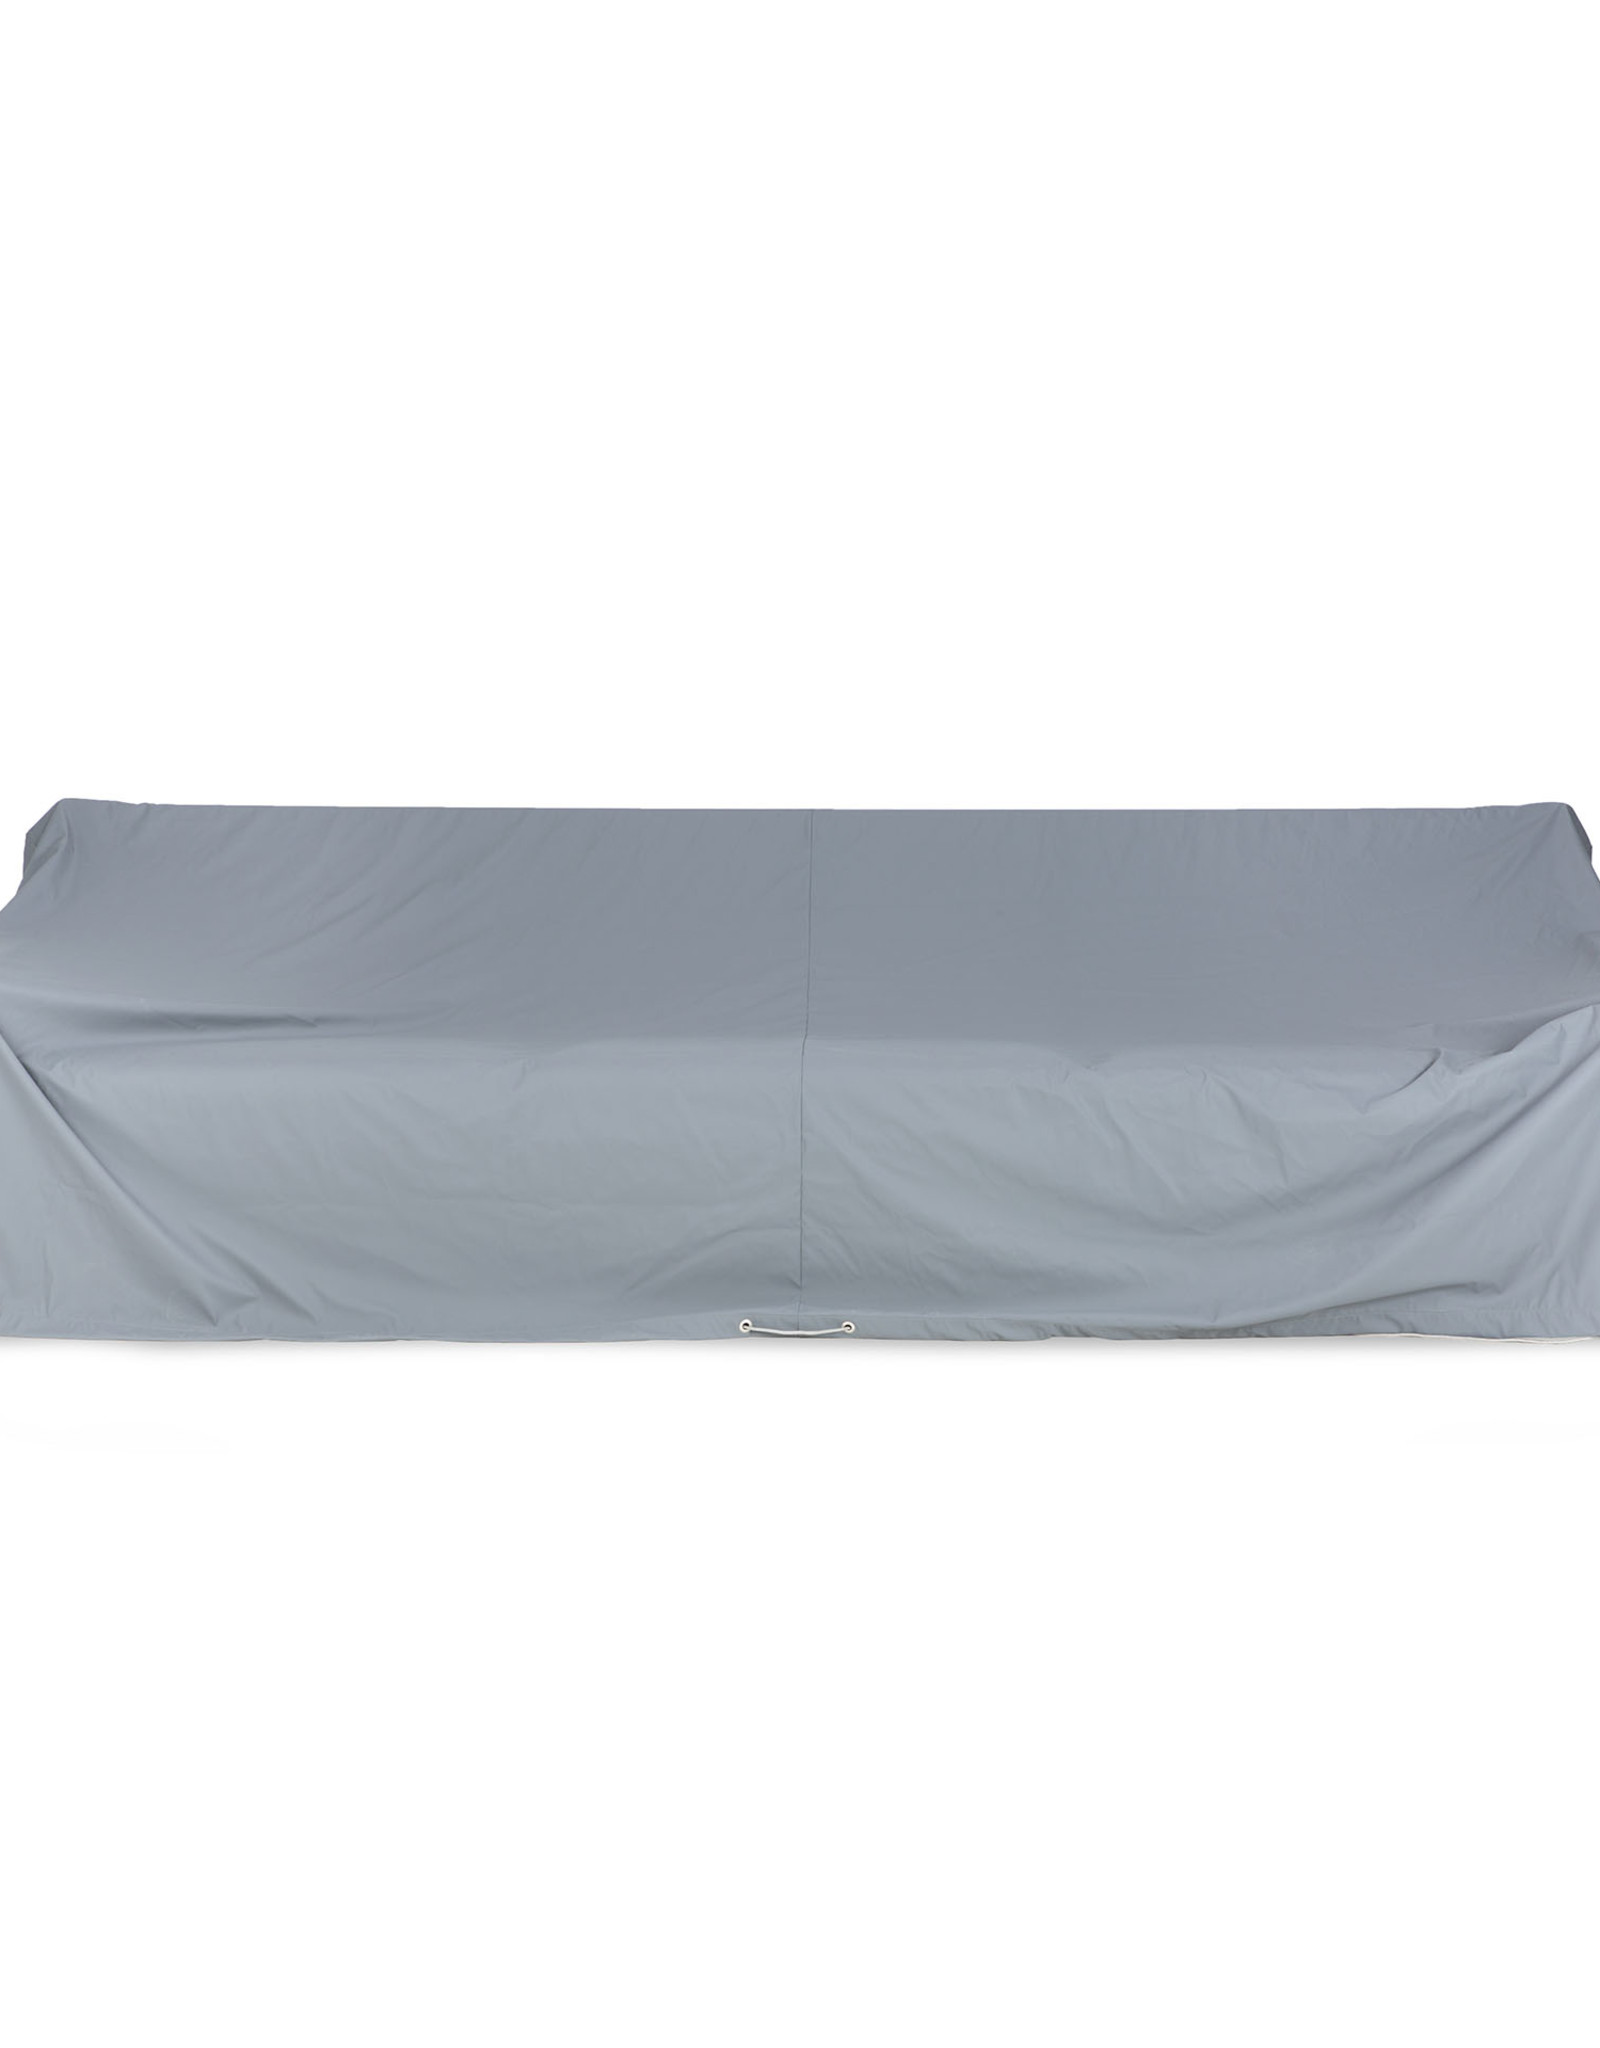 Raincover Jack outdoor sofa, 104 x 35 x 30